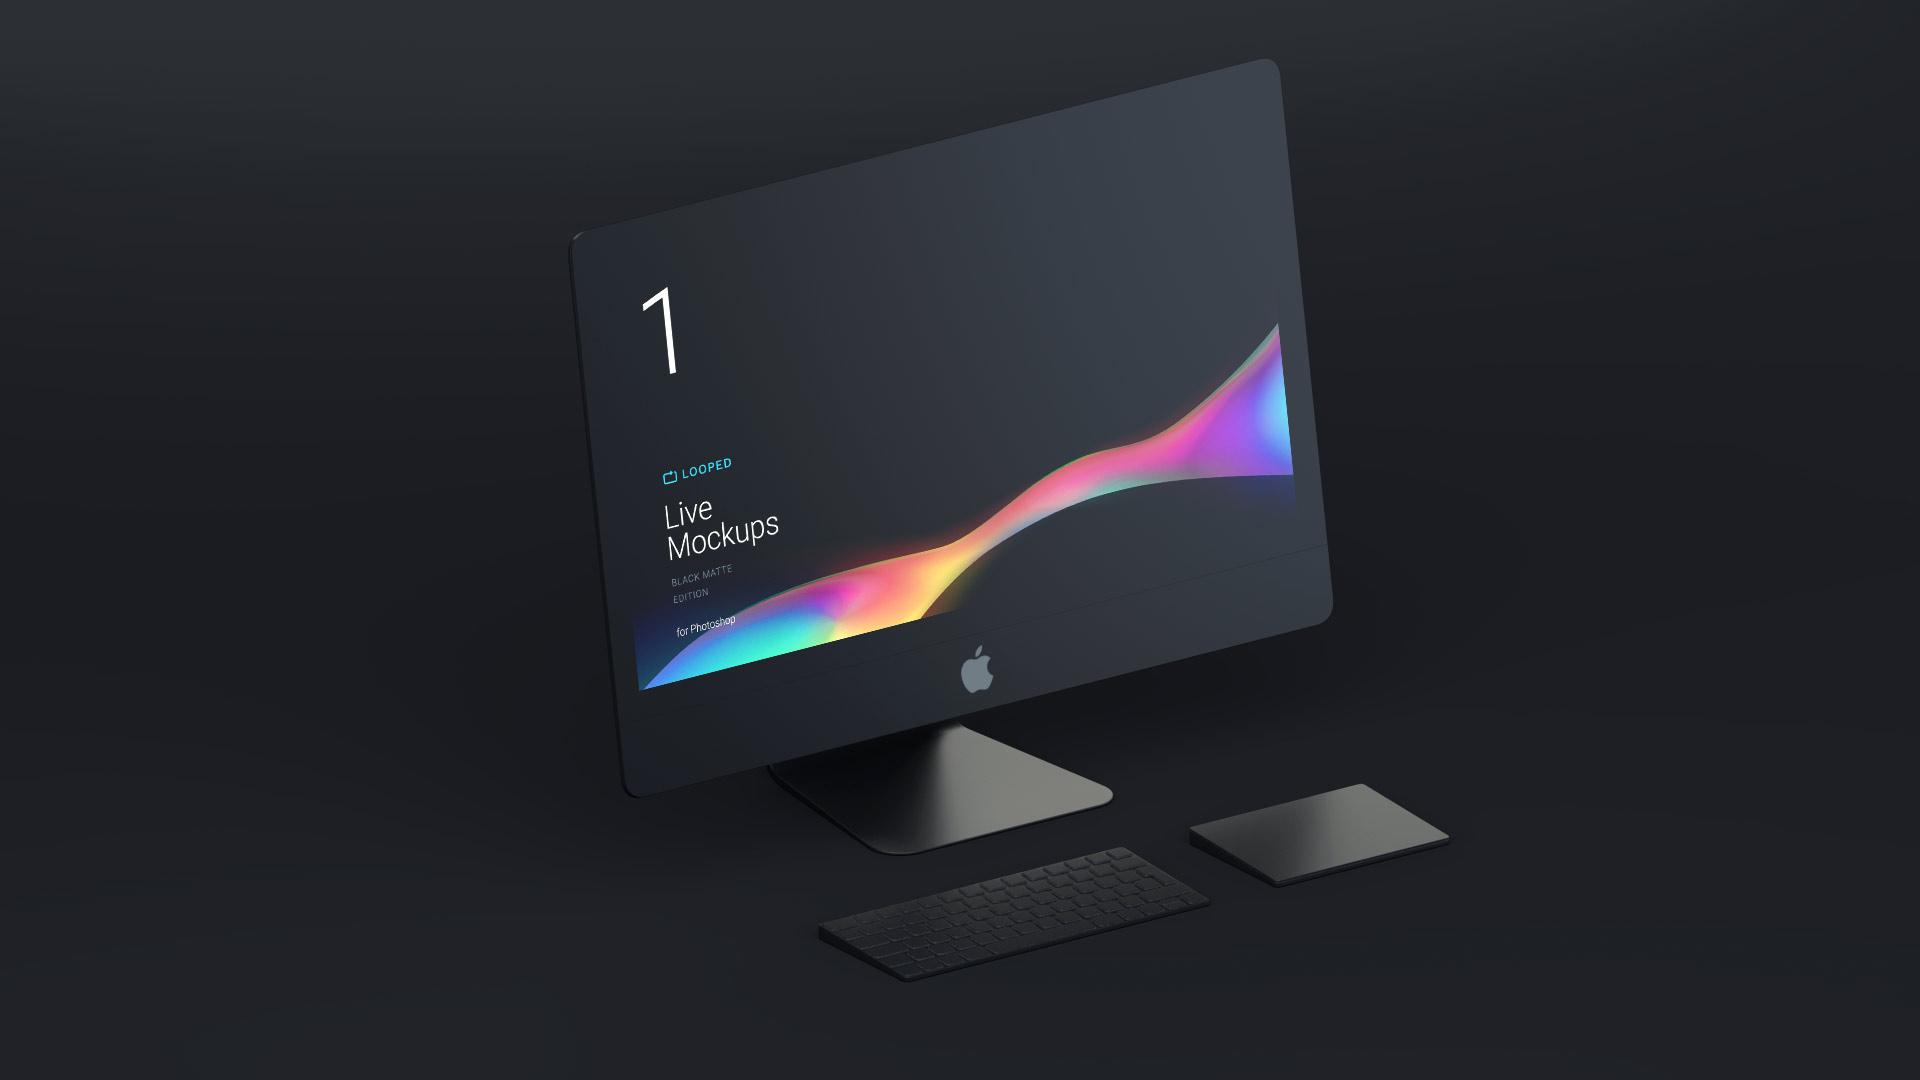 Free iMac Mockup PSD Designs